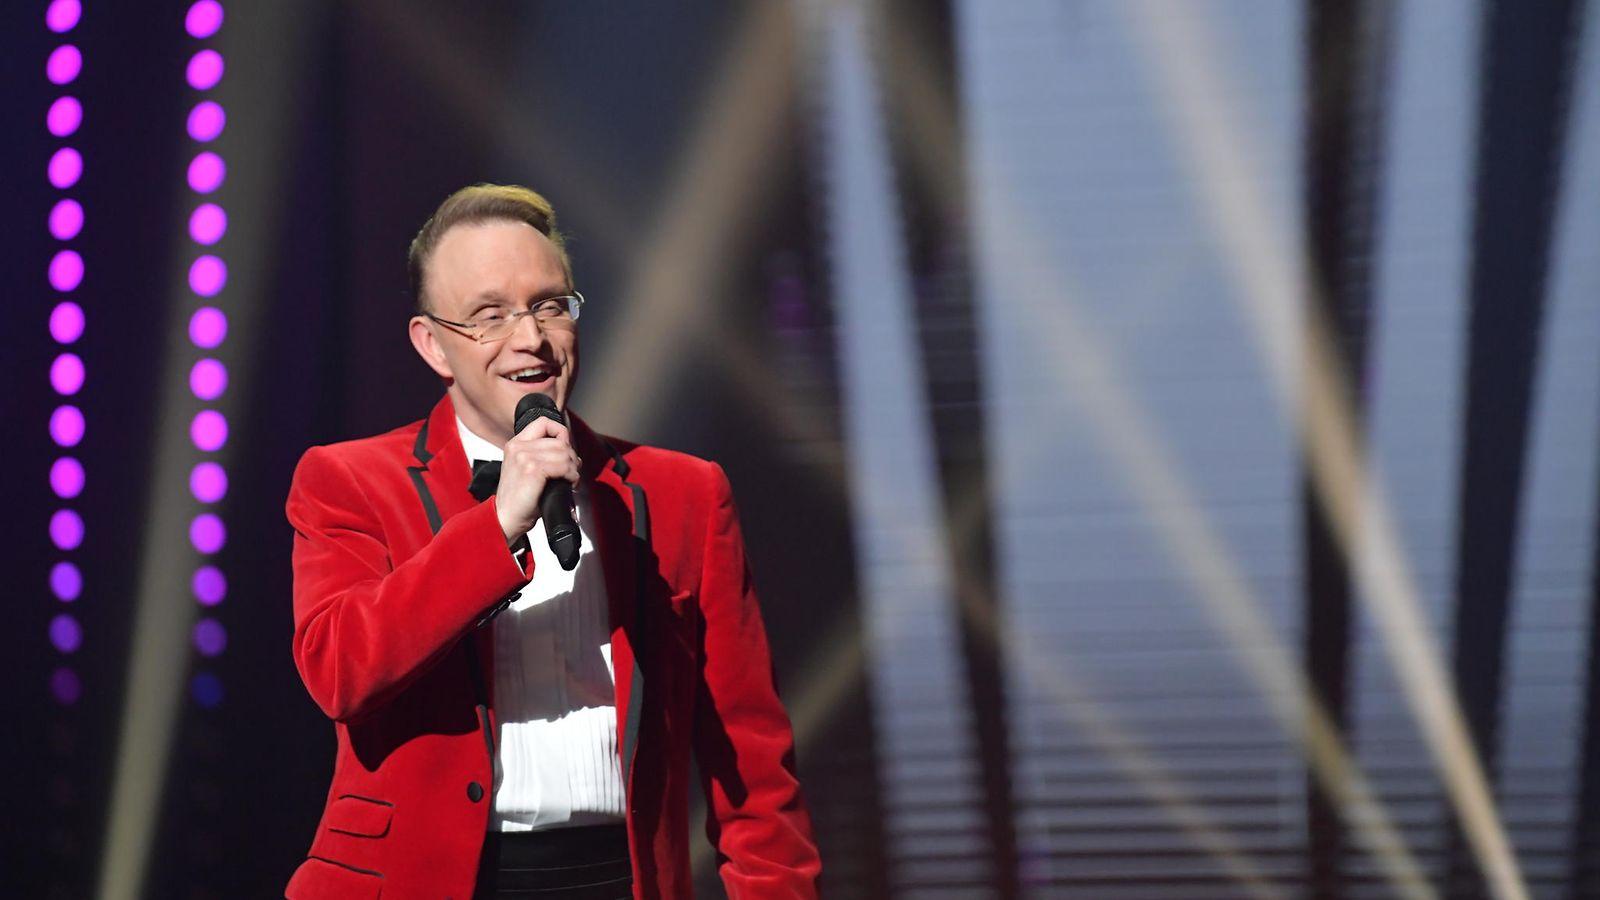 Markku Uhlbäck Vaimo